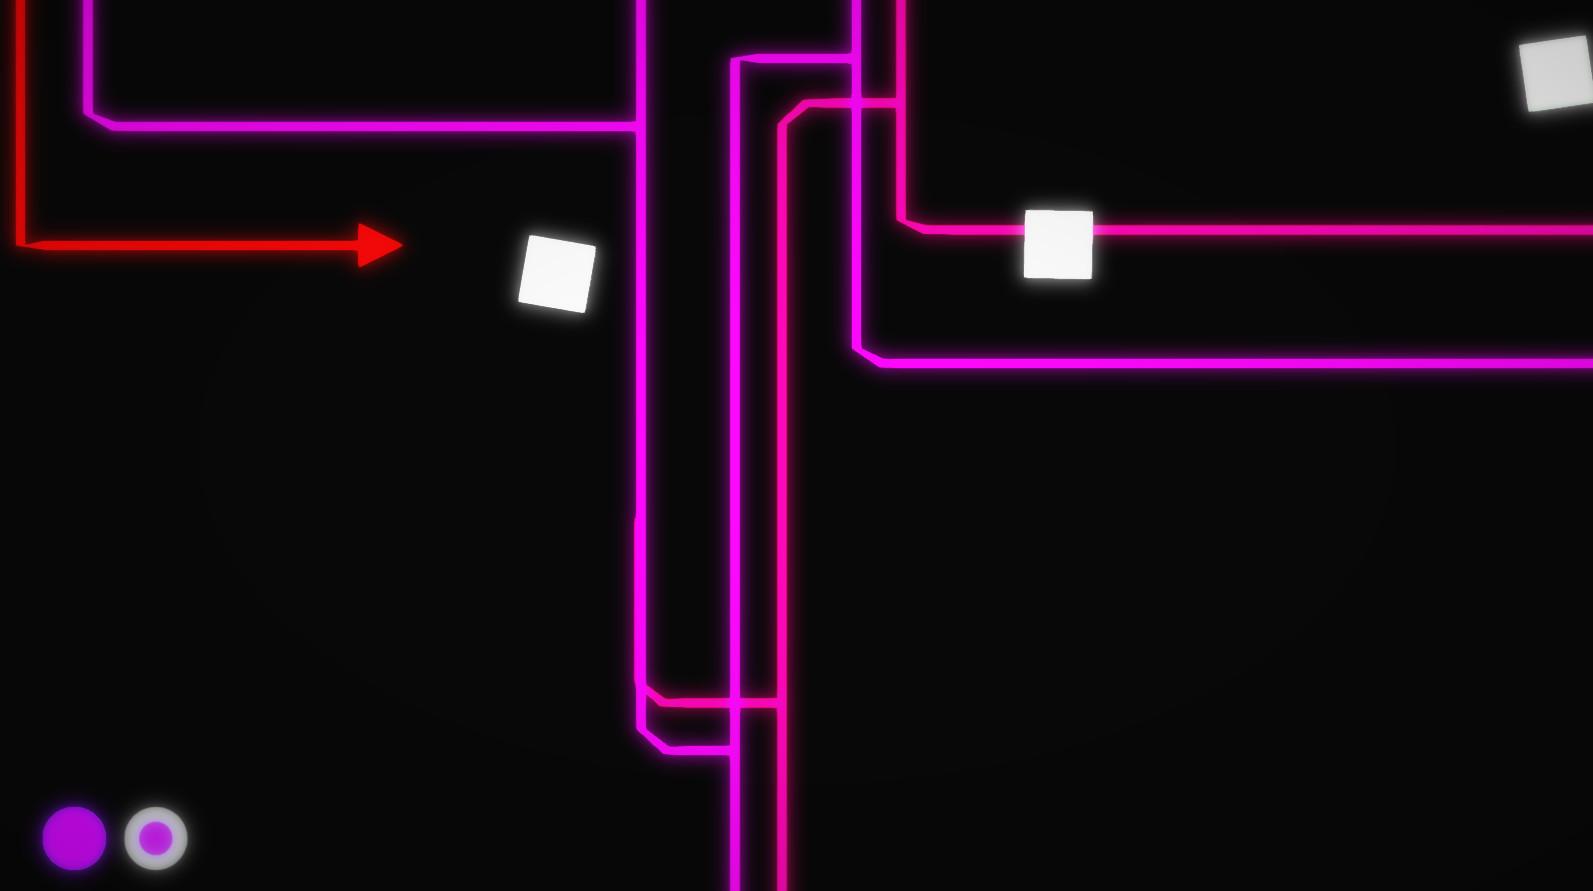 LineDash screenshot